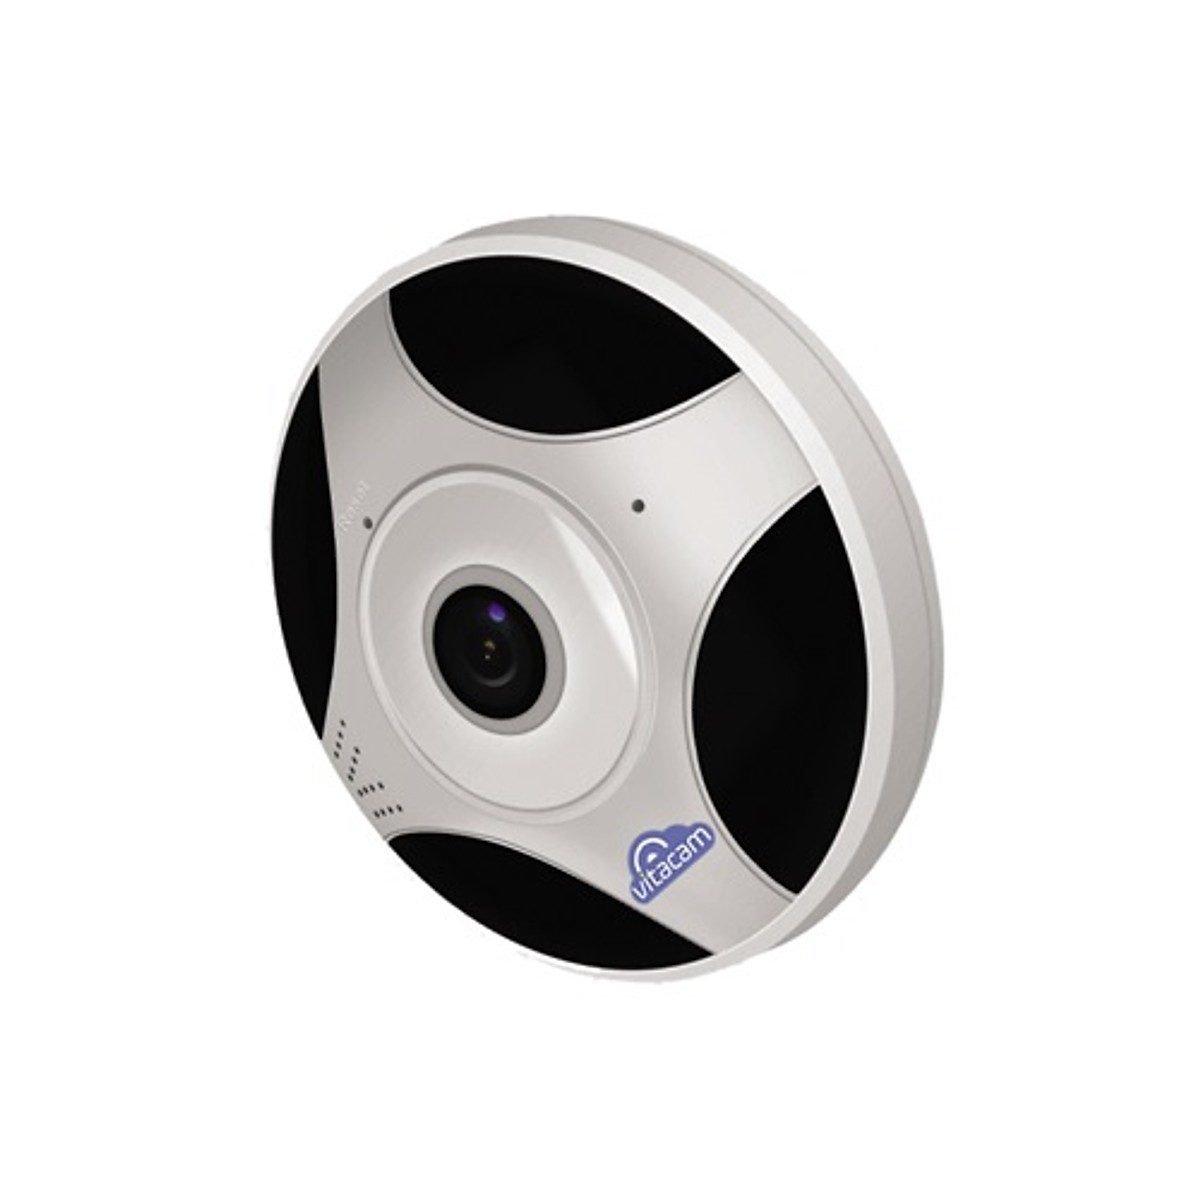 Camera IP Wifi VITACAM VR1080 2.0MP